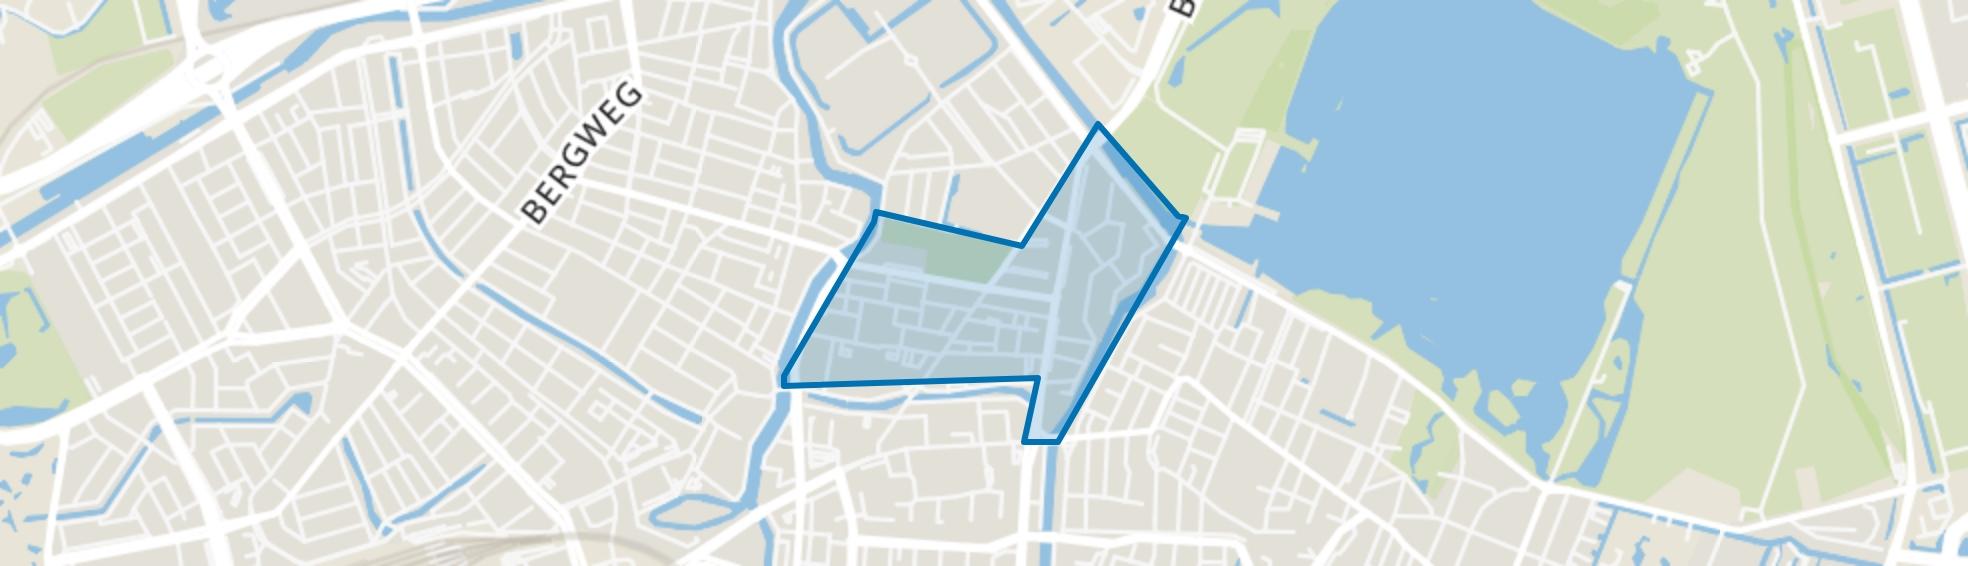 Oud Crooswijk, Rotterdam map